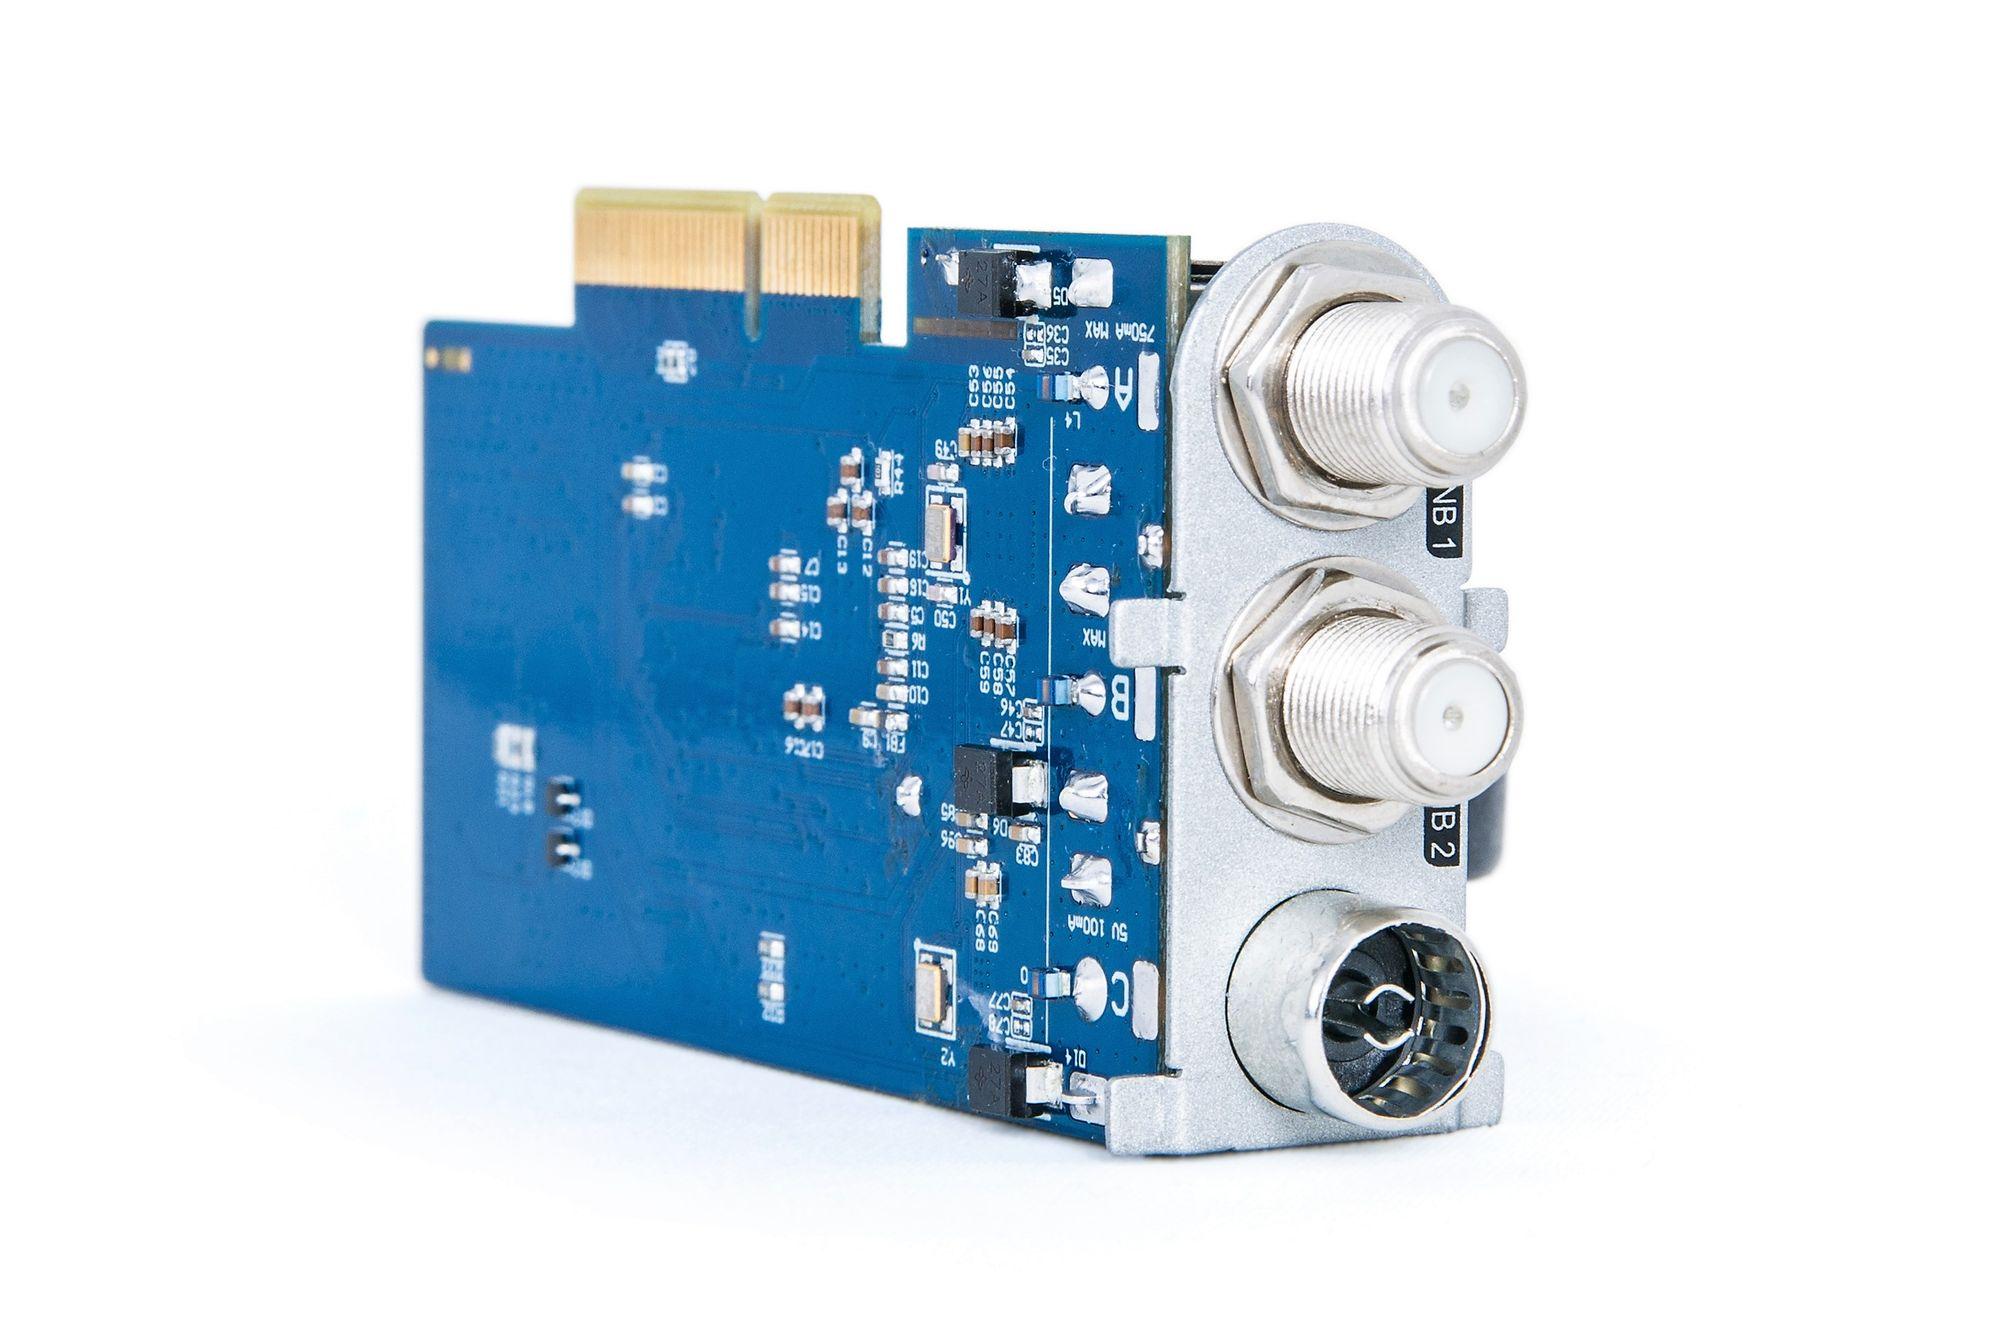 Dreambox Hybrid Triple Tuner 2x DVB-S/S2 / 1x DVB-C/T2 H.265 Plug & Play für DM7080 HD DM820 DM900 UHD 4K